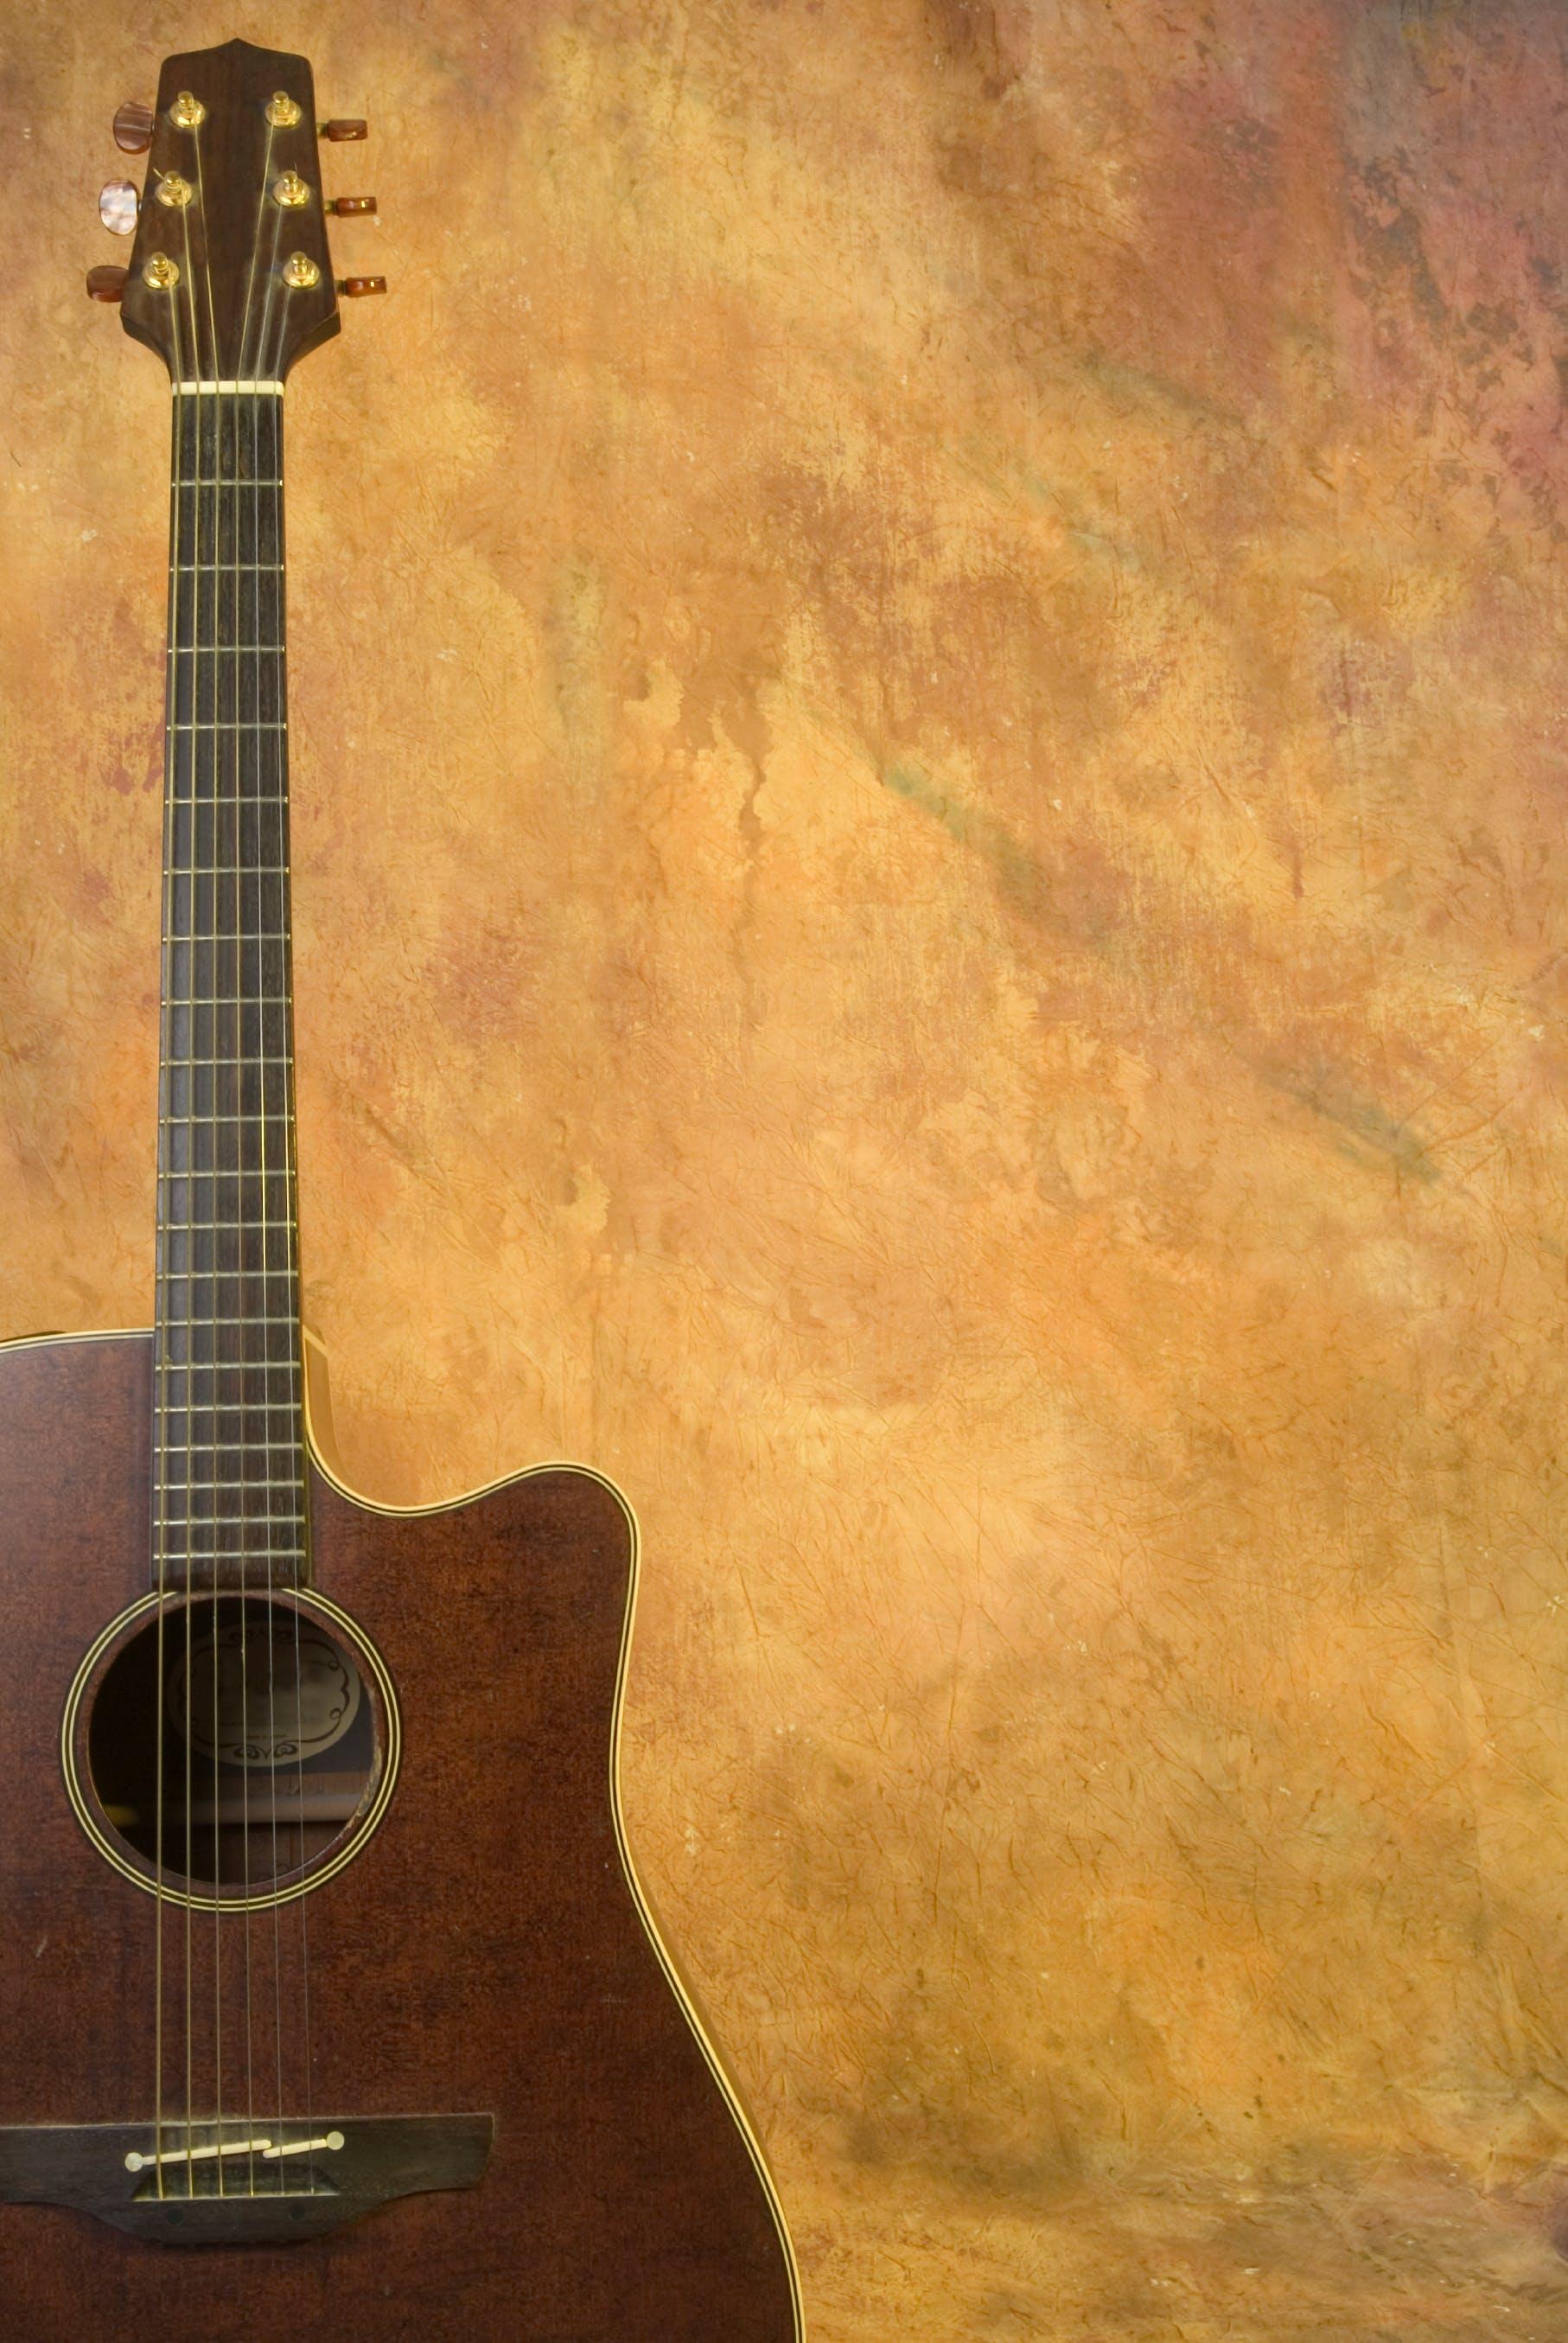 Free stock photo of acoustic guitar, camera, free, guitar